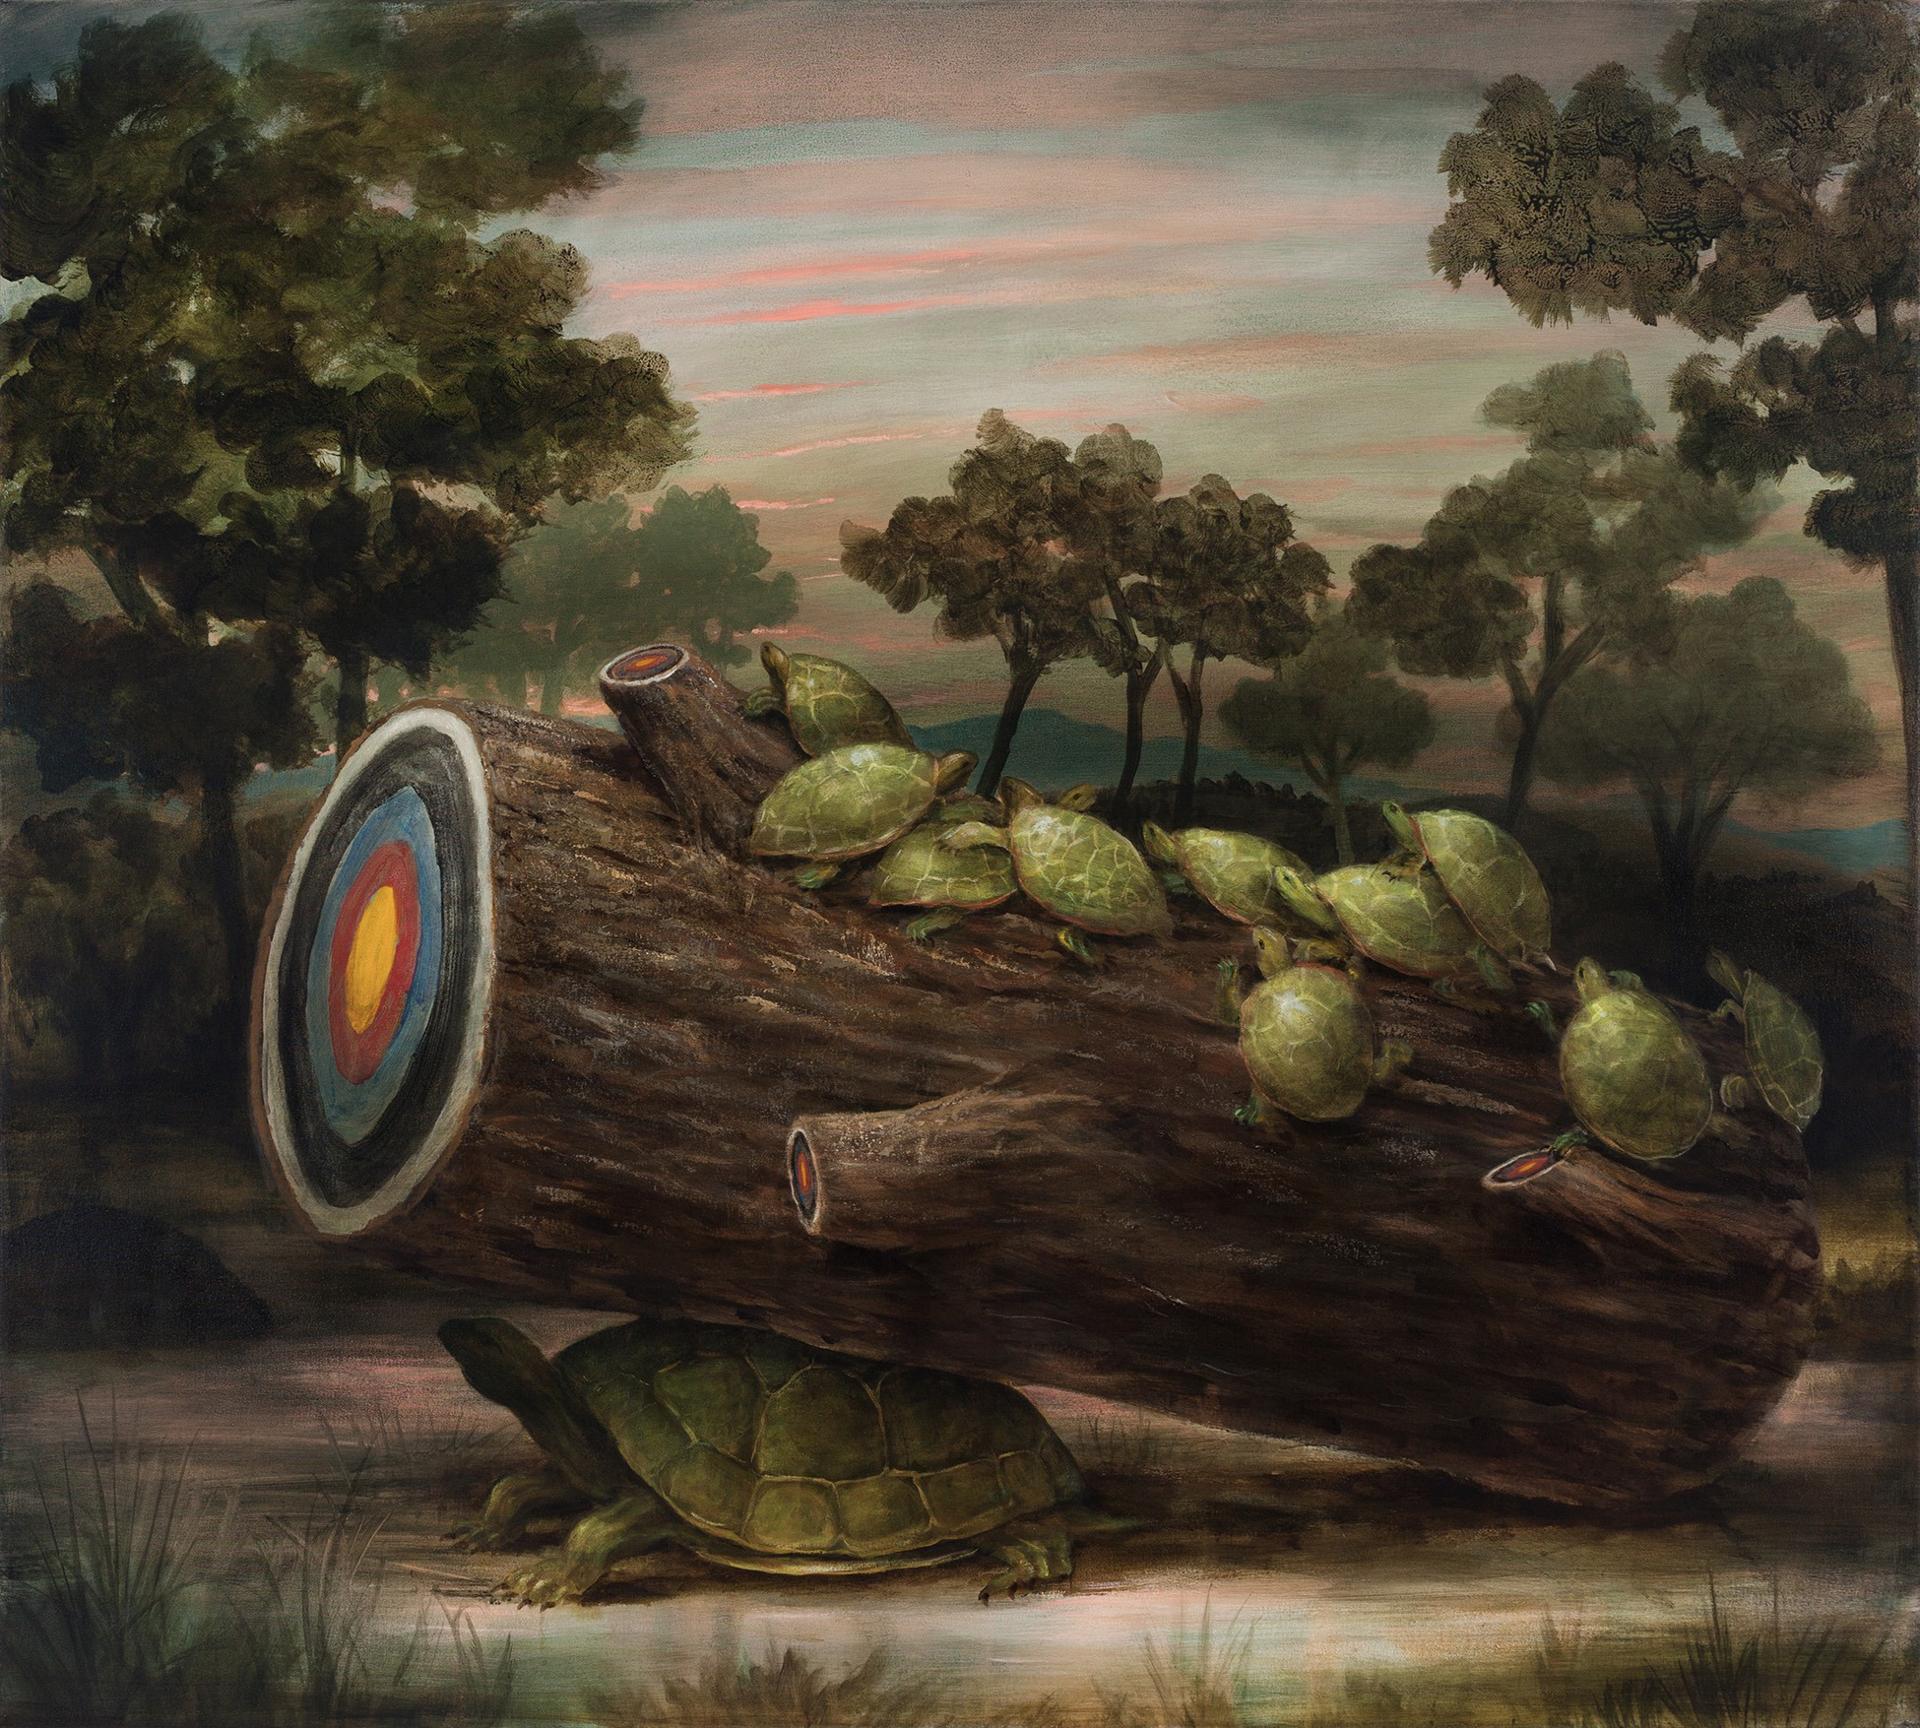 Turtle Island by Kevin Sloan